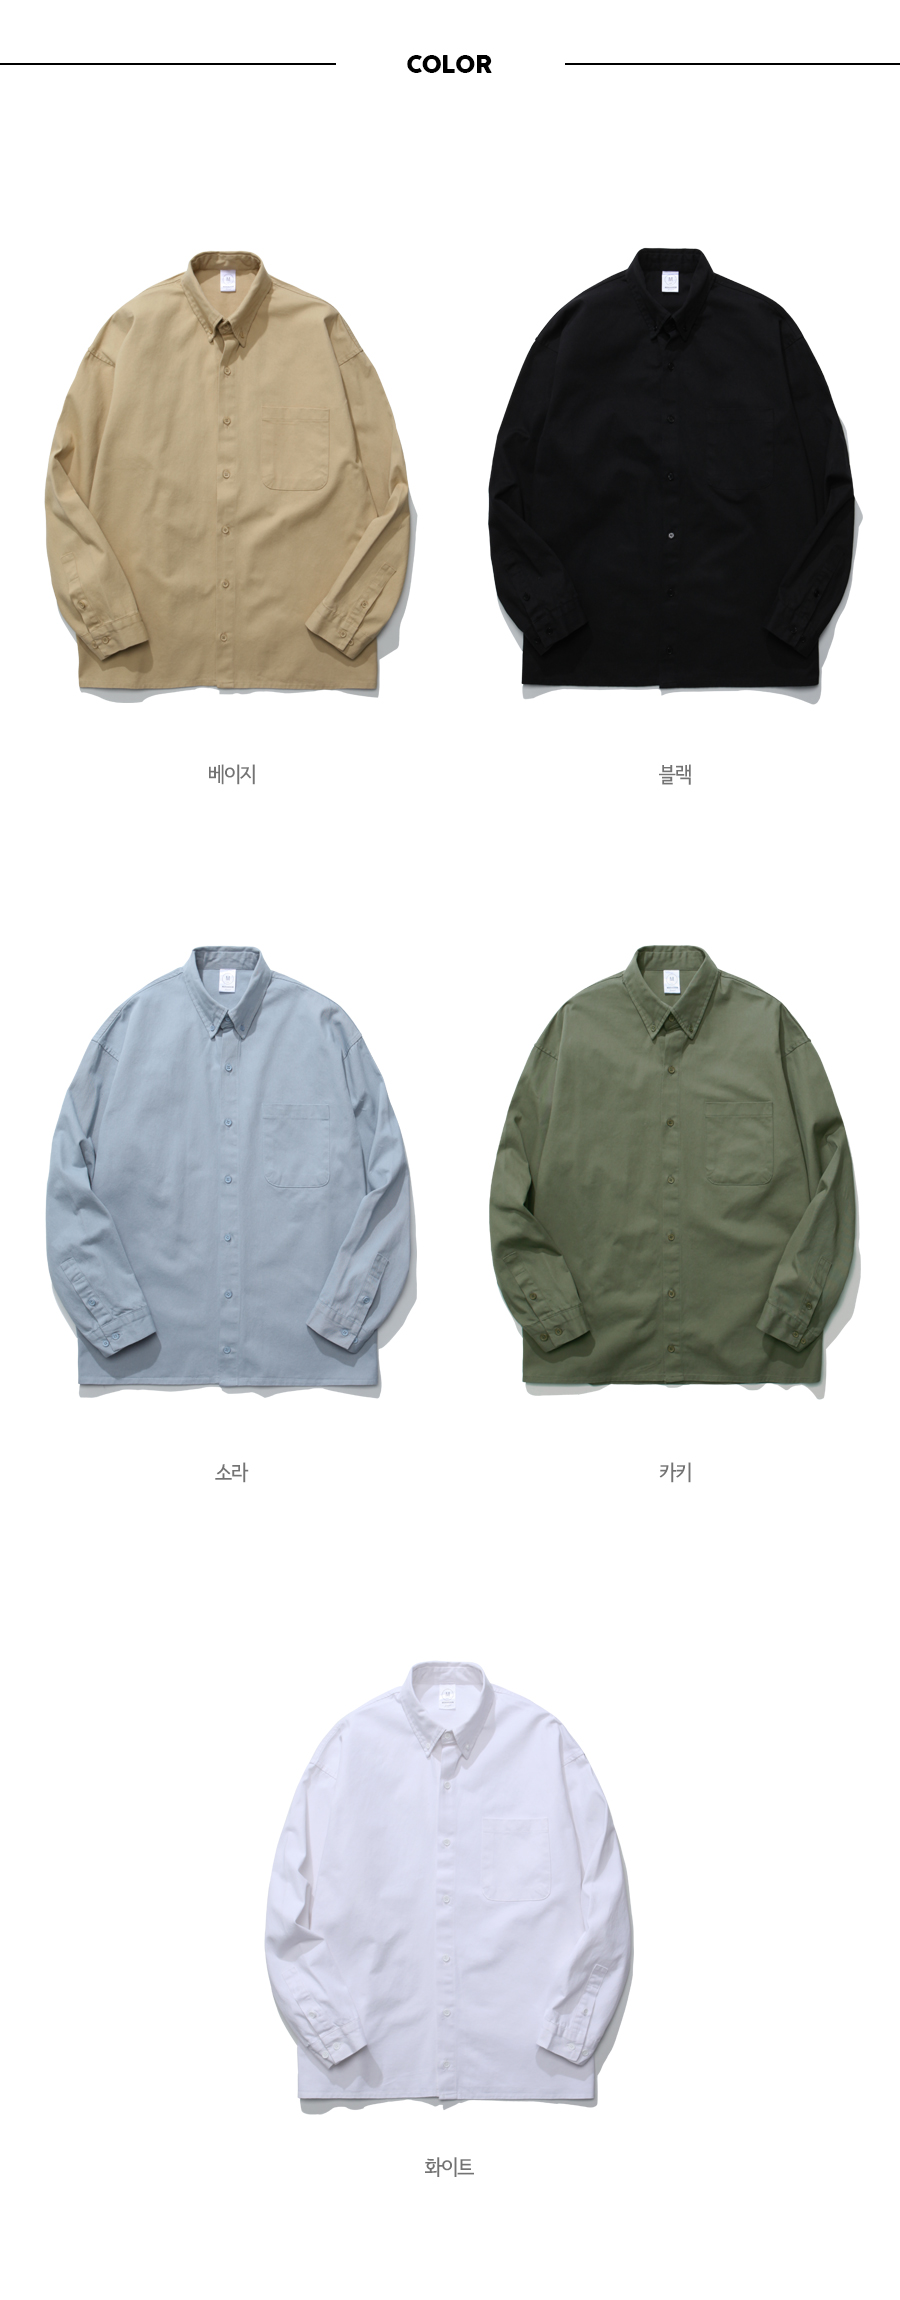 20190208_jennie_overfit_shirts_color_yh.jpg